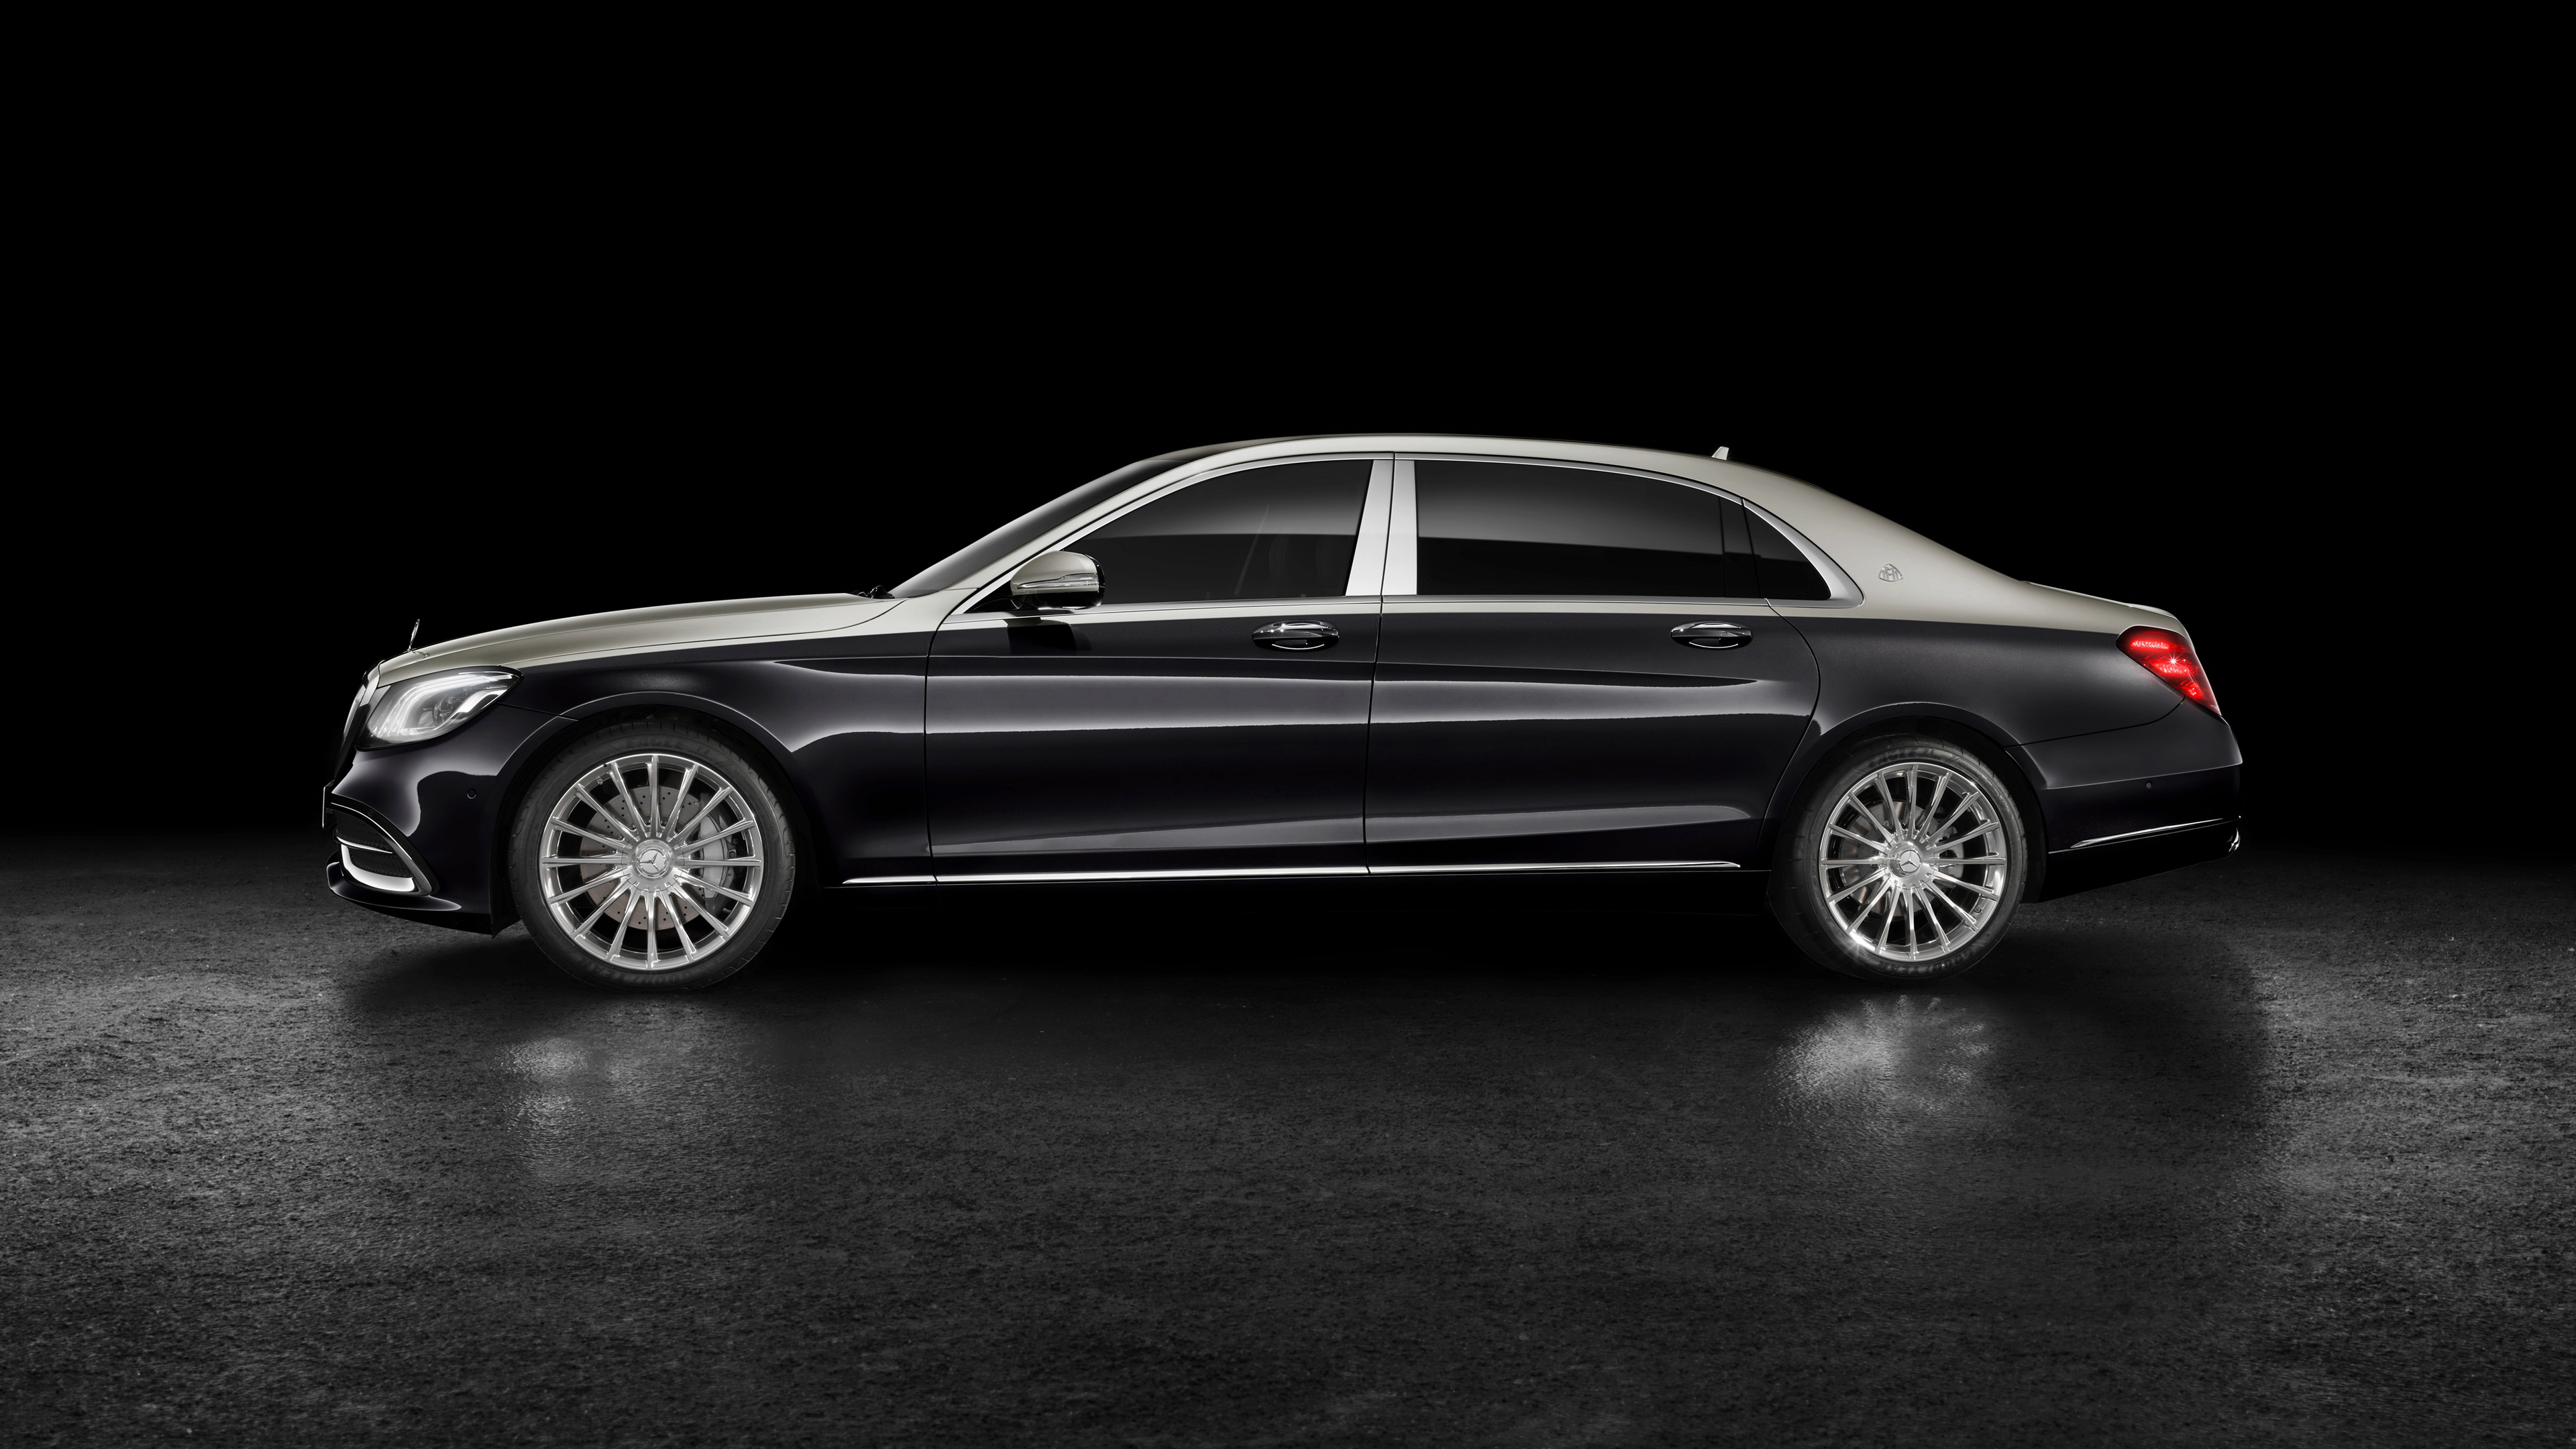 mercedes benz maybach s 560 2018 1539109415 - Mercedes Benz Maybach S 560 2018 - mercedes wallpapers, mercedes maybach wallpapers, hd-wallpapers, cars wallpapers, 4k-wallpapers, 2018 cars wallpapers